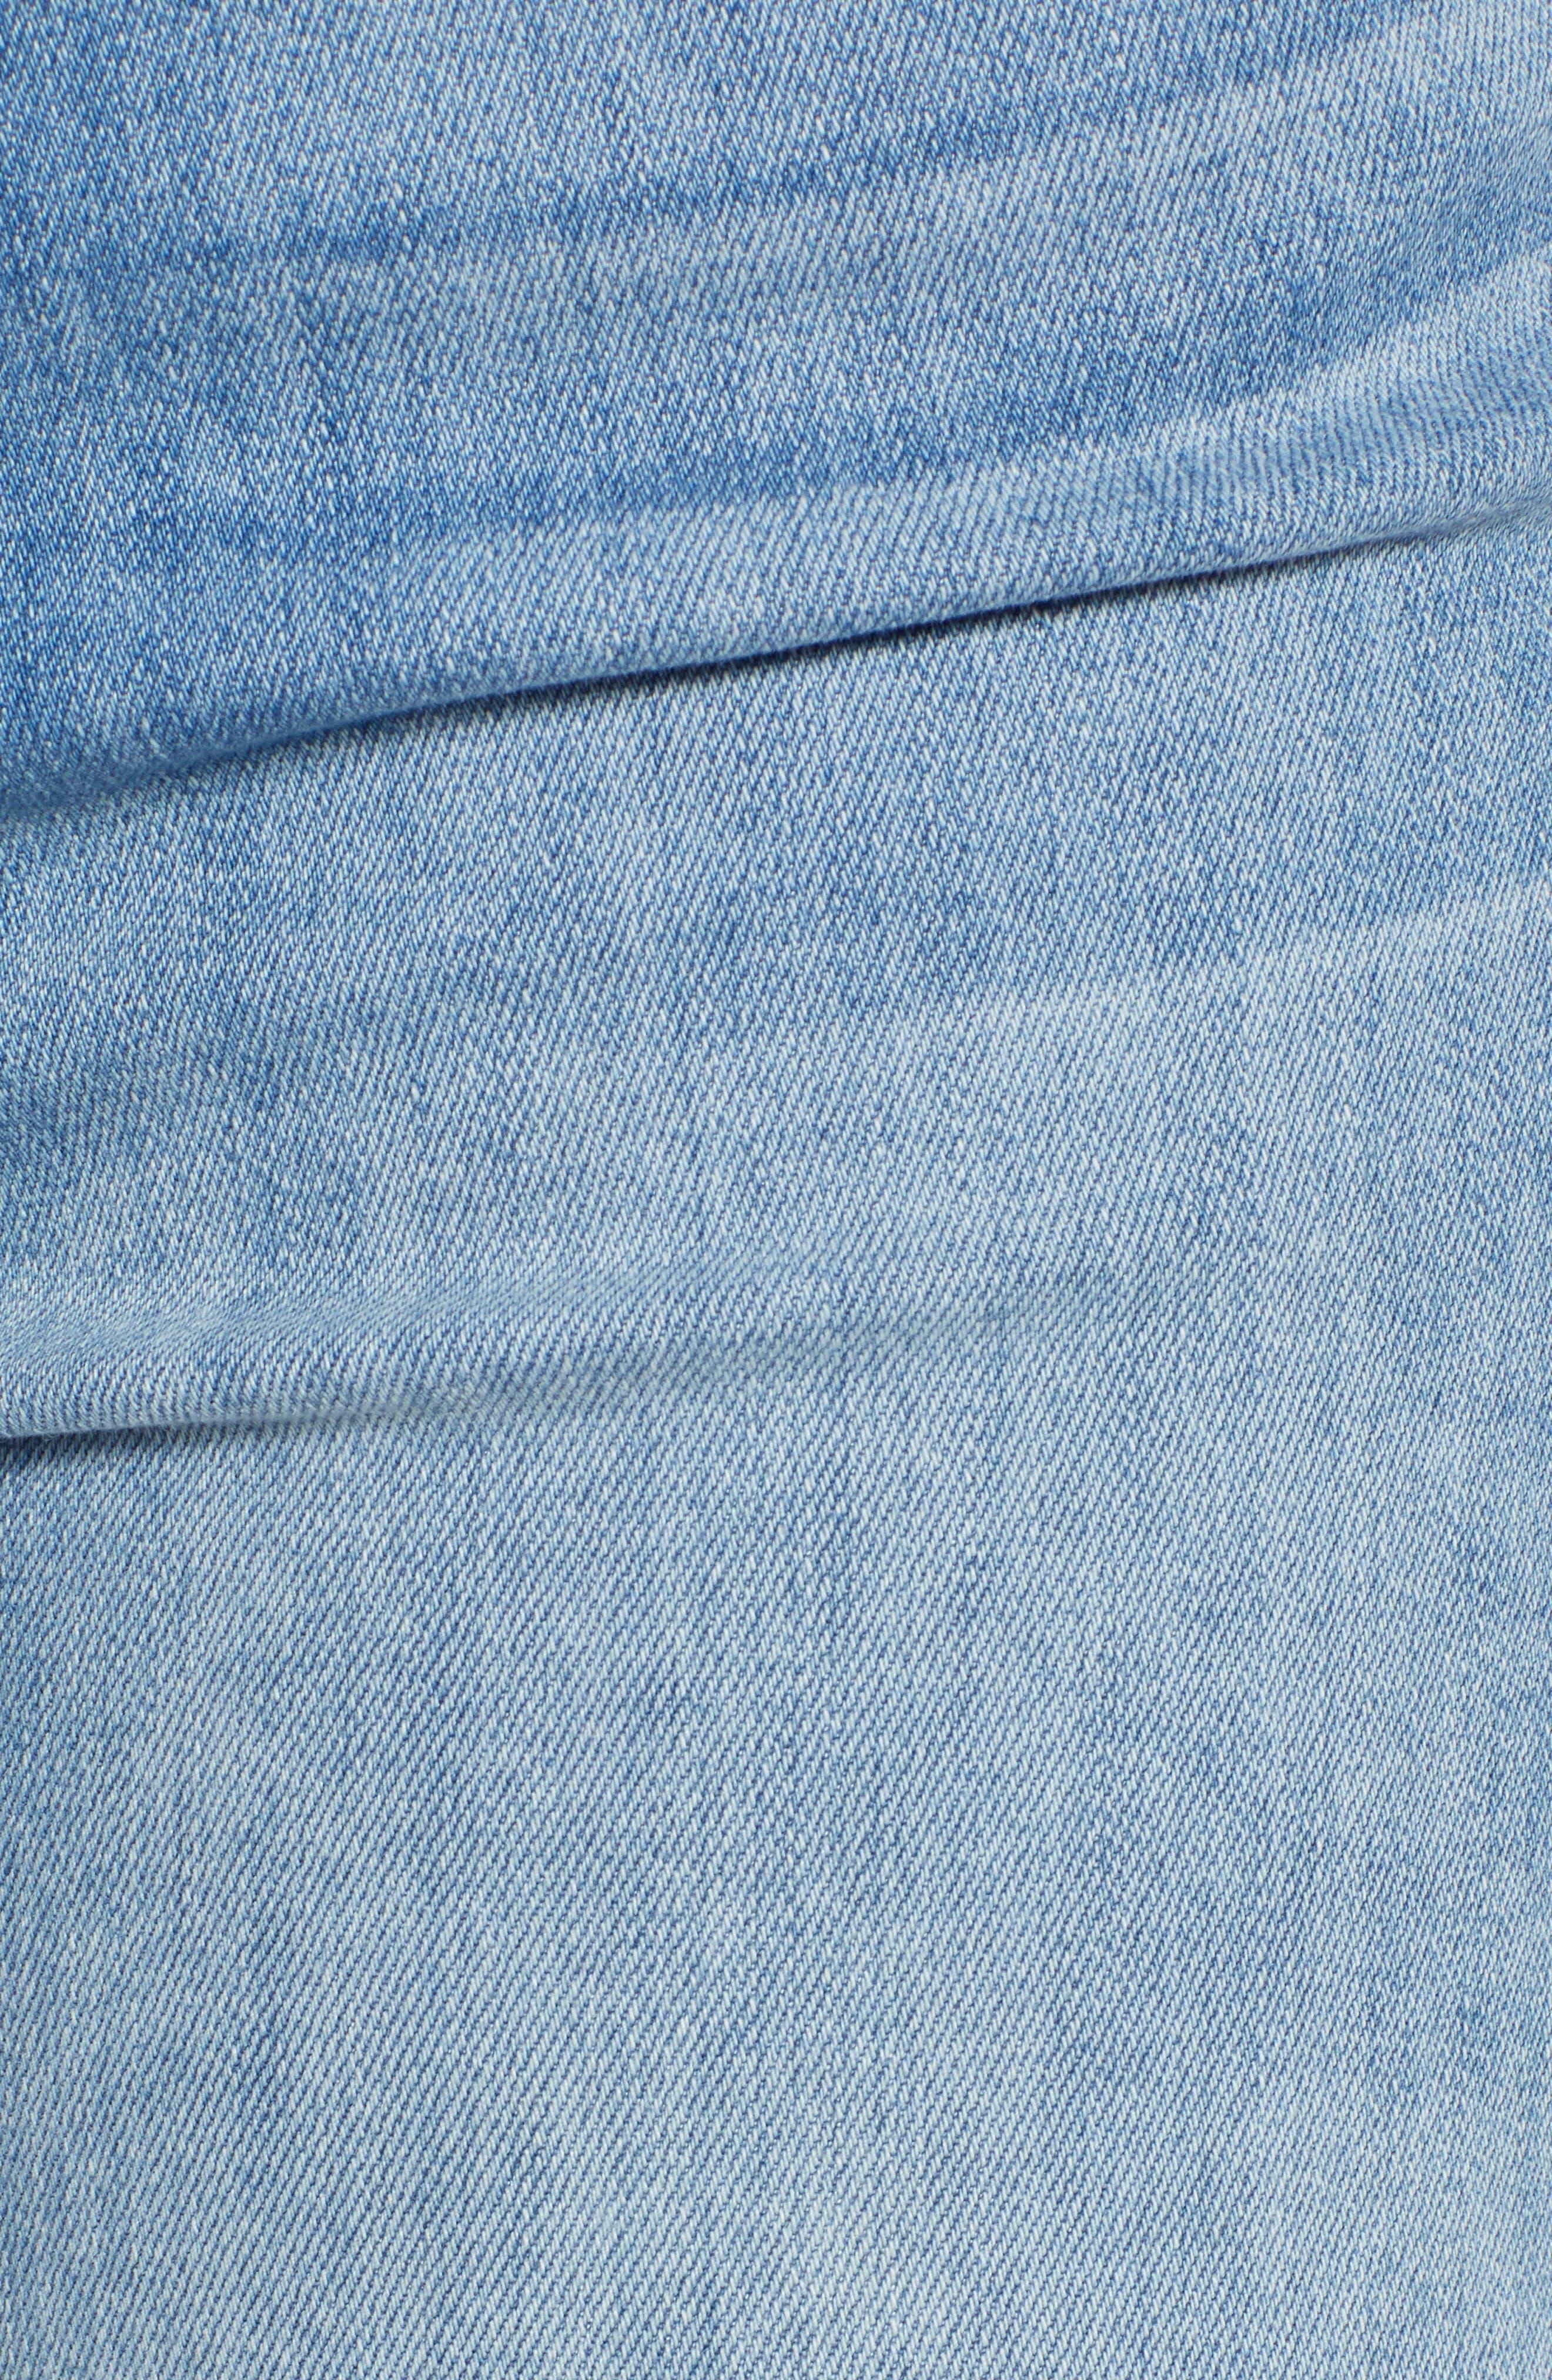 JEN7 BY 7 FOR ALL MANKIND, Pompom Detail Crop Skinny Jeans, Alternate thumbnail 5, color, LA QUINTA POM POM